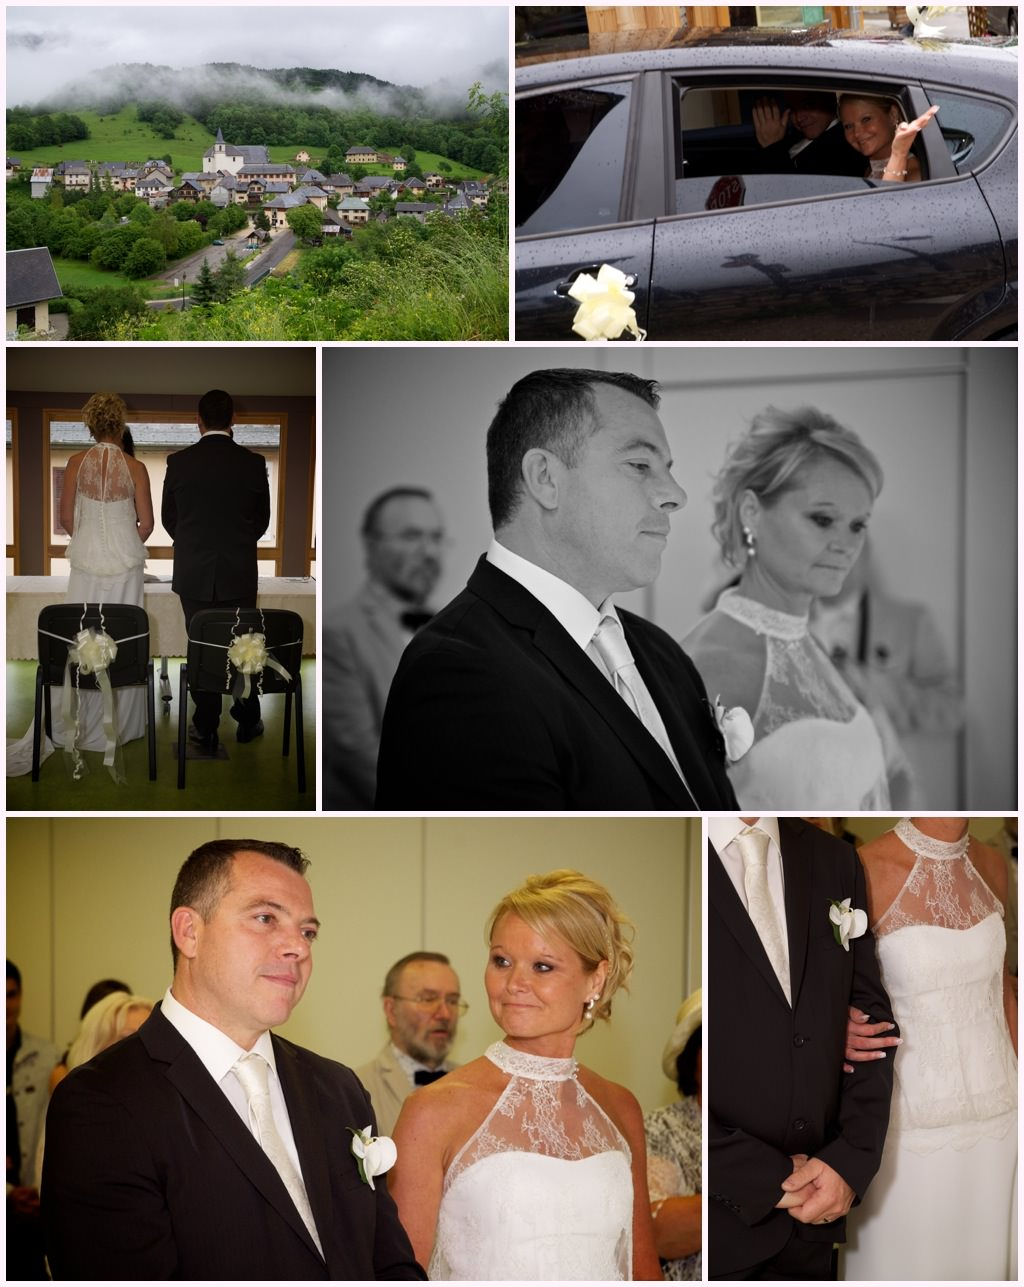 photographe mariage grenoble chambery cérémonie chartreuse